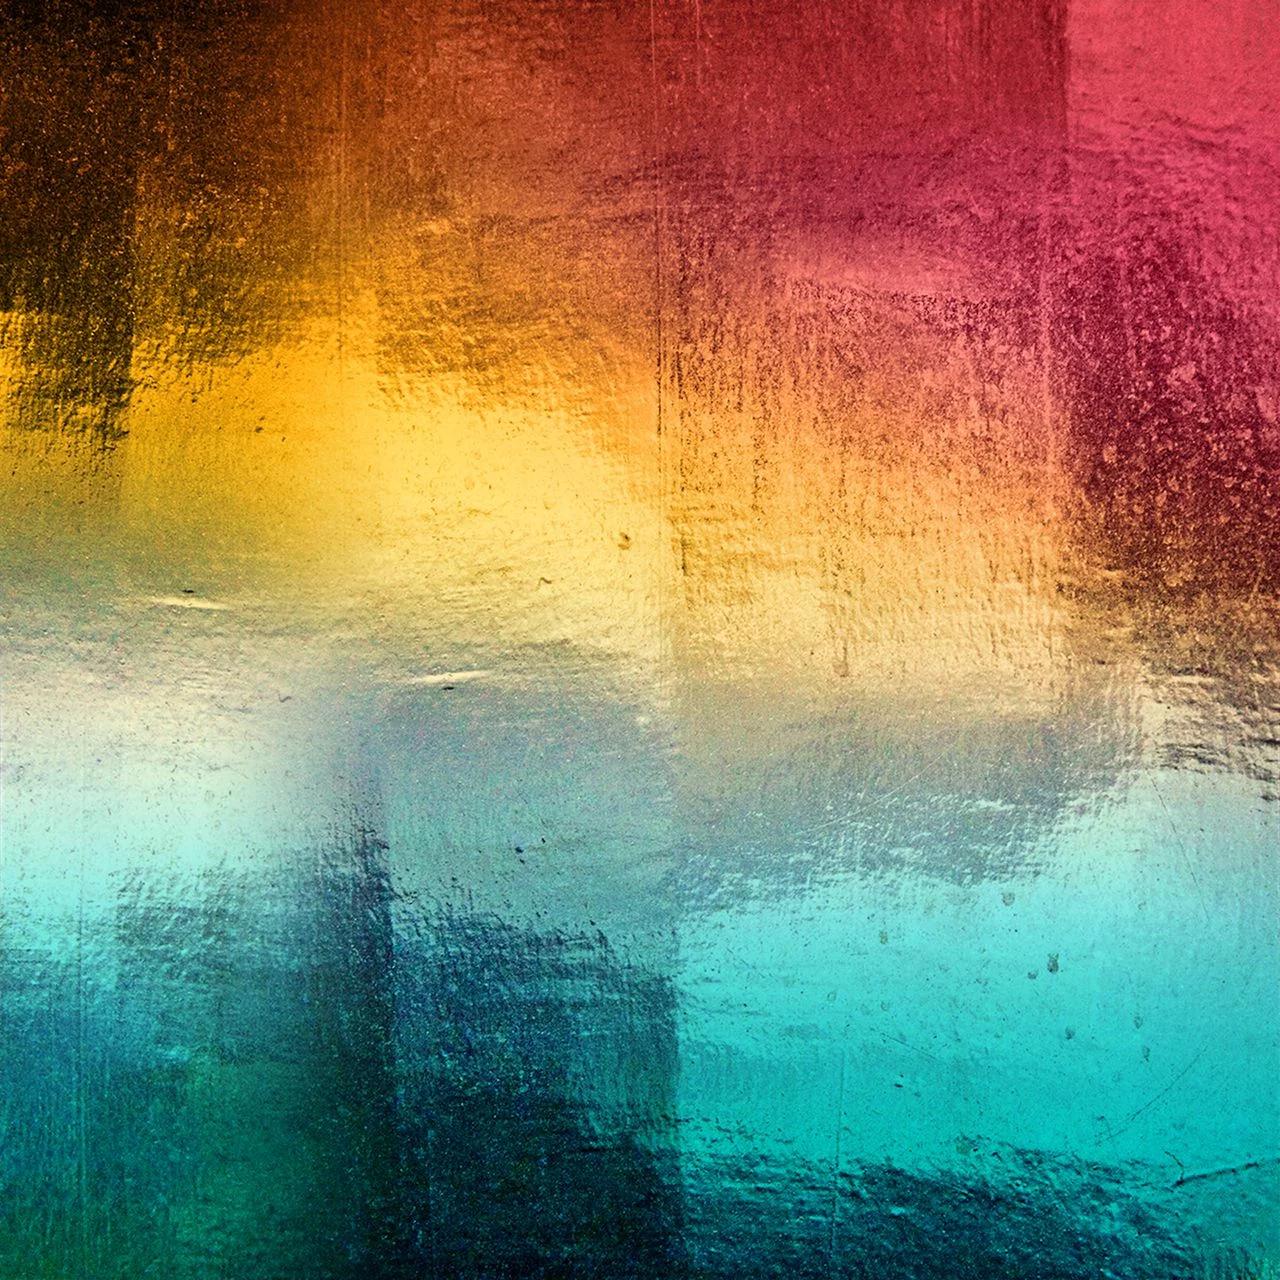 wallpaper_0041